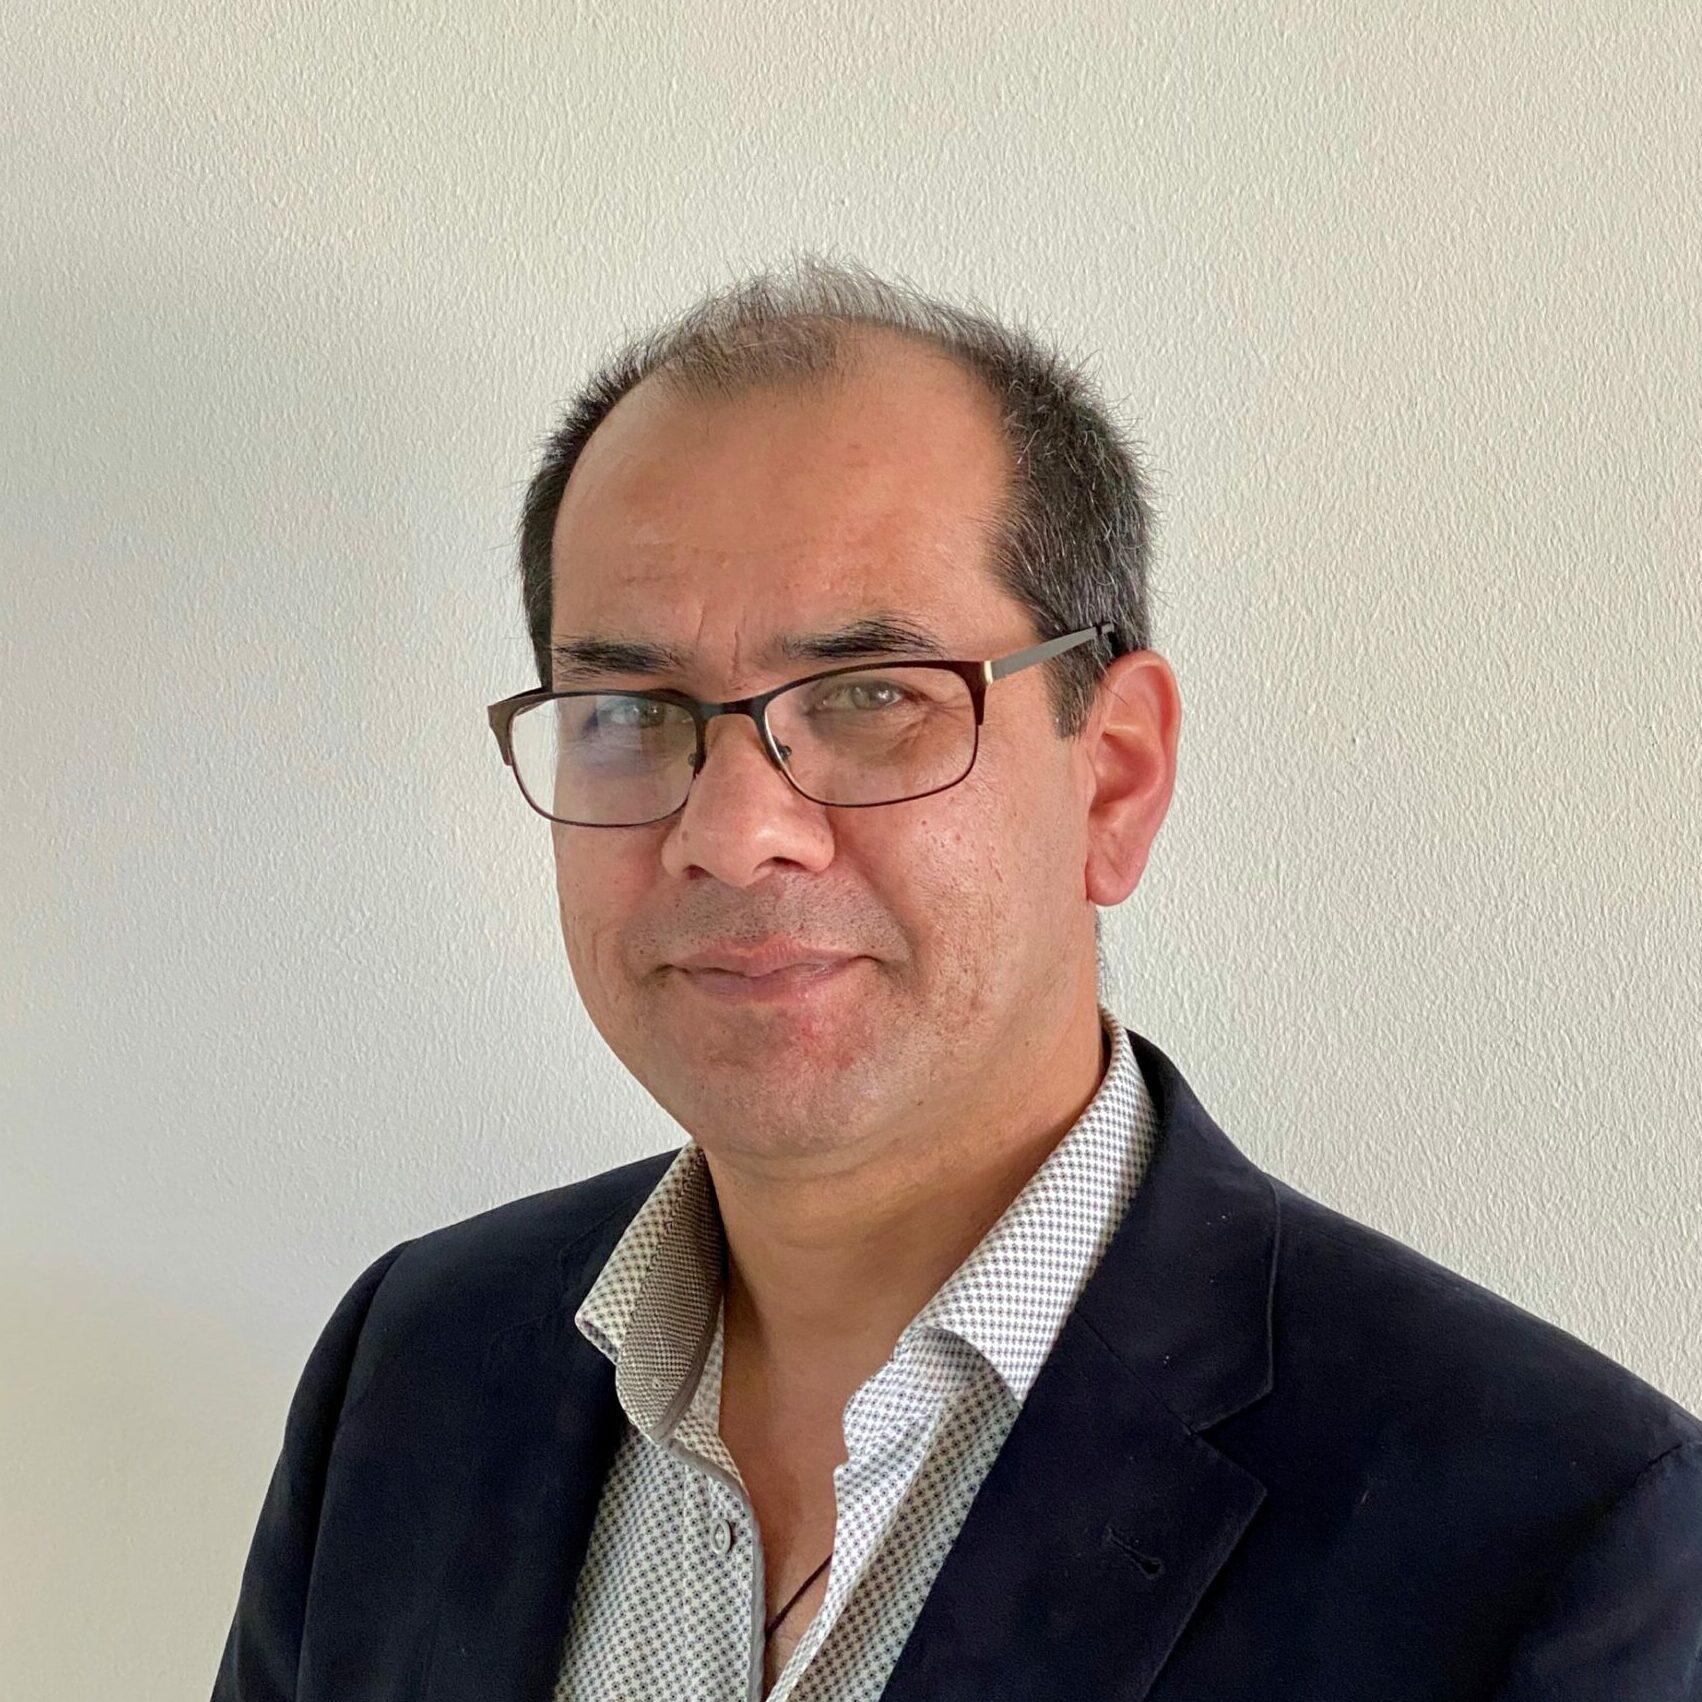 Behnam Etemady